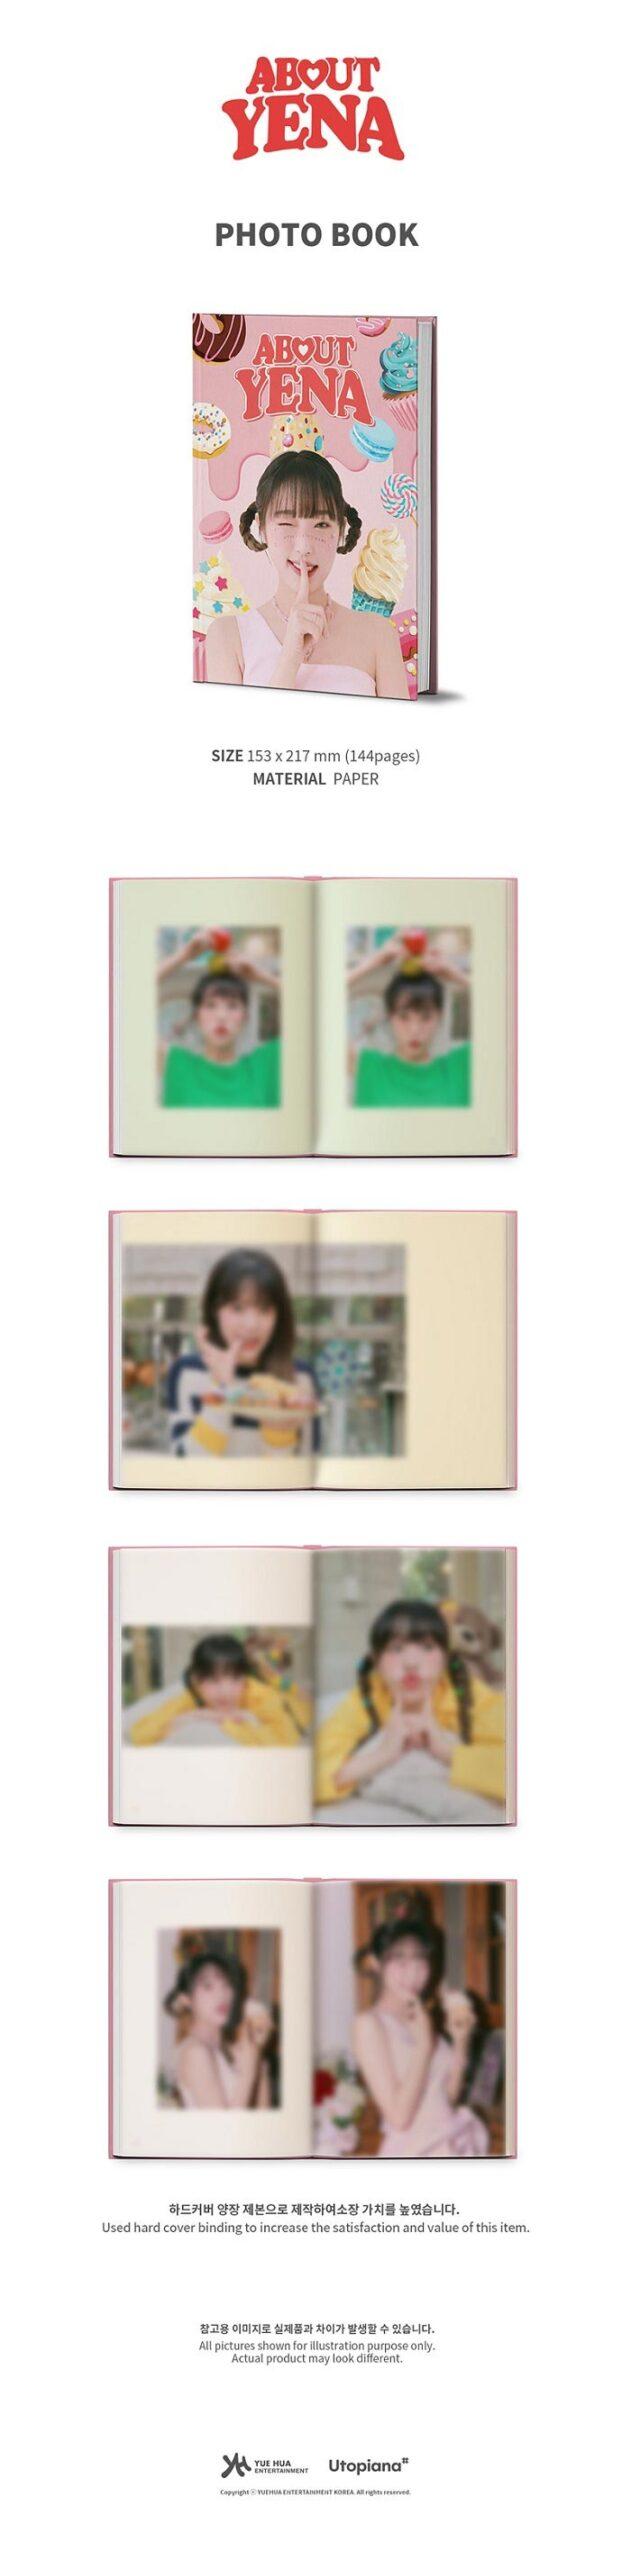 CHOI YENA IZONE ABOUT YENA B DAY PHOTO BOOK